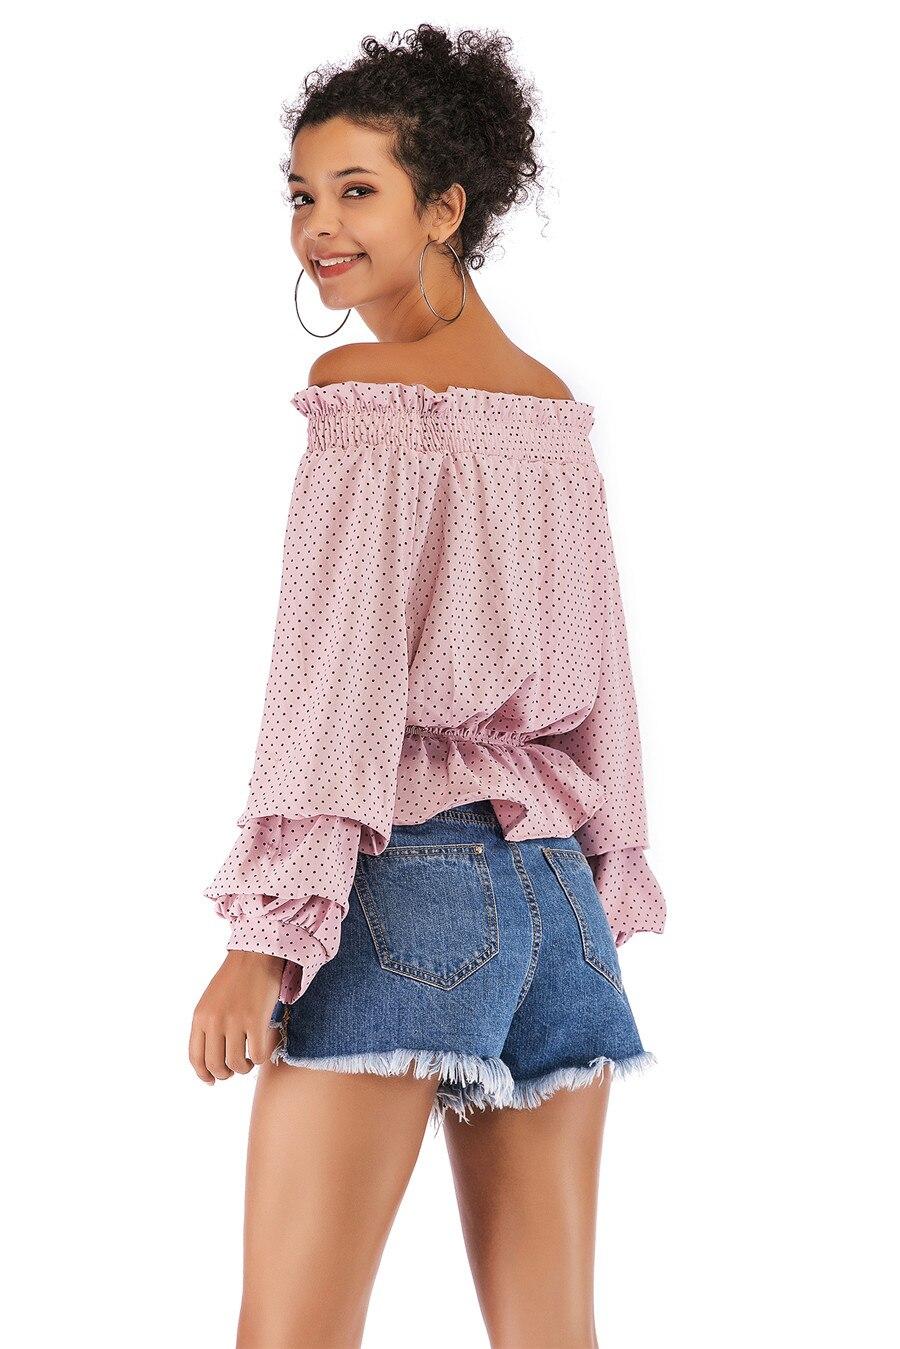 Gladiolus Chiffon Blouse Women 2019 Spring Autumn Long Sleeve Polka Dot Off Shoulder Sexy Blouses Women Shirts Ruffles Blusas (31)